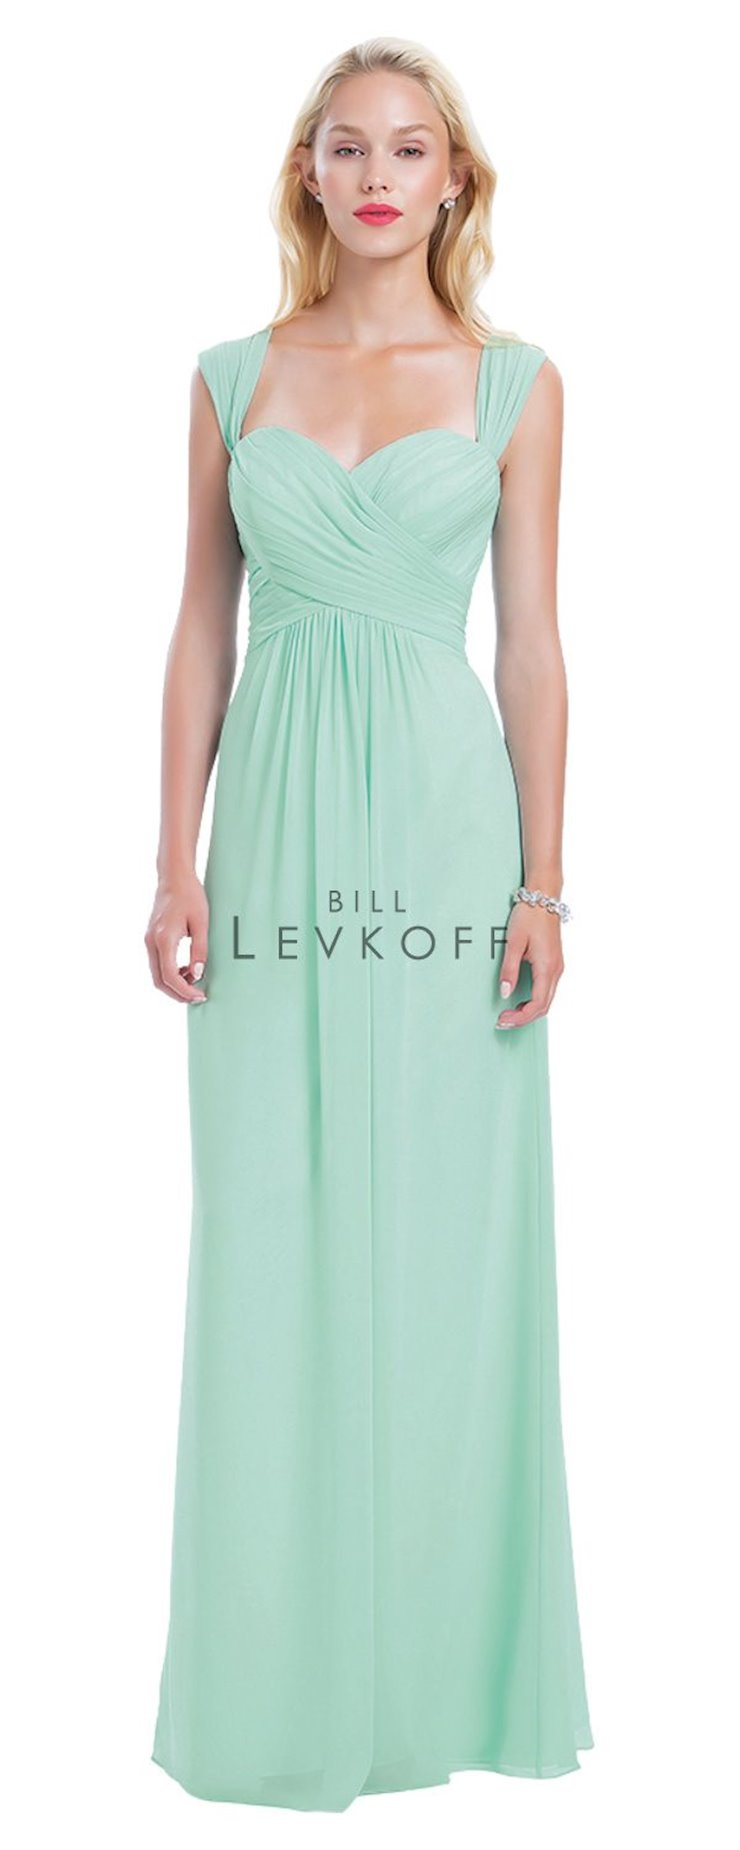 Bill Levkoff Style 1160